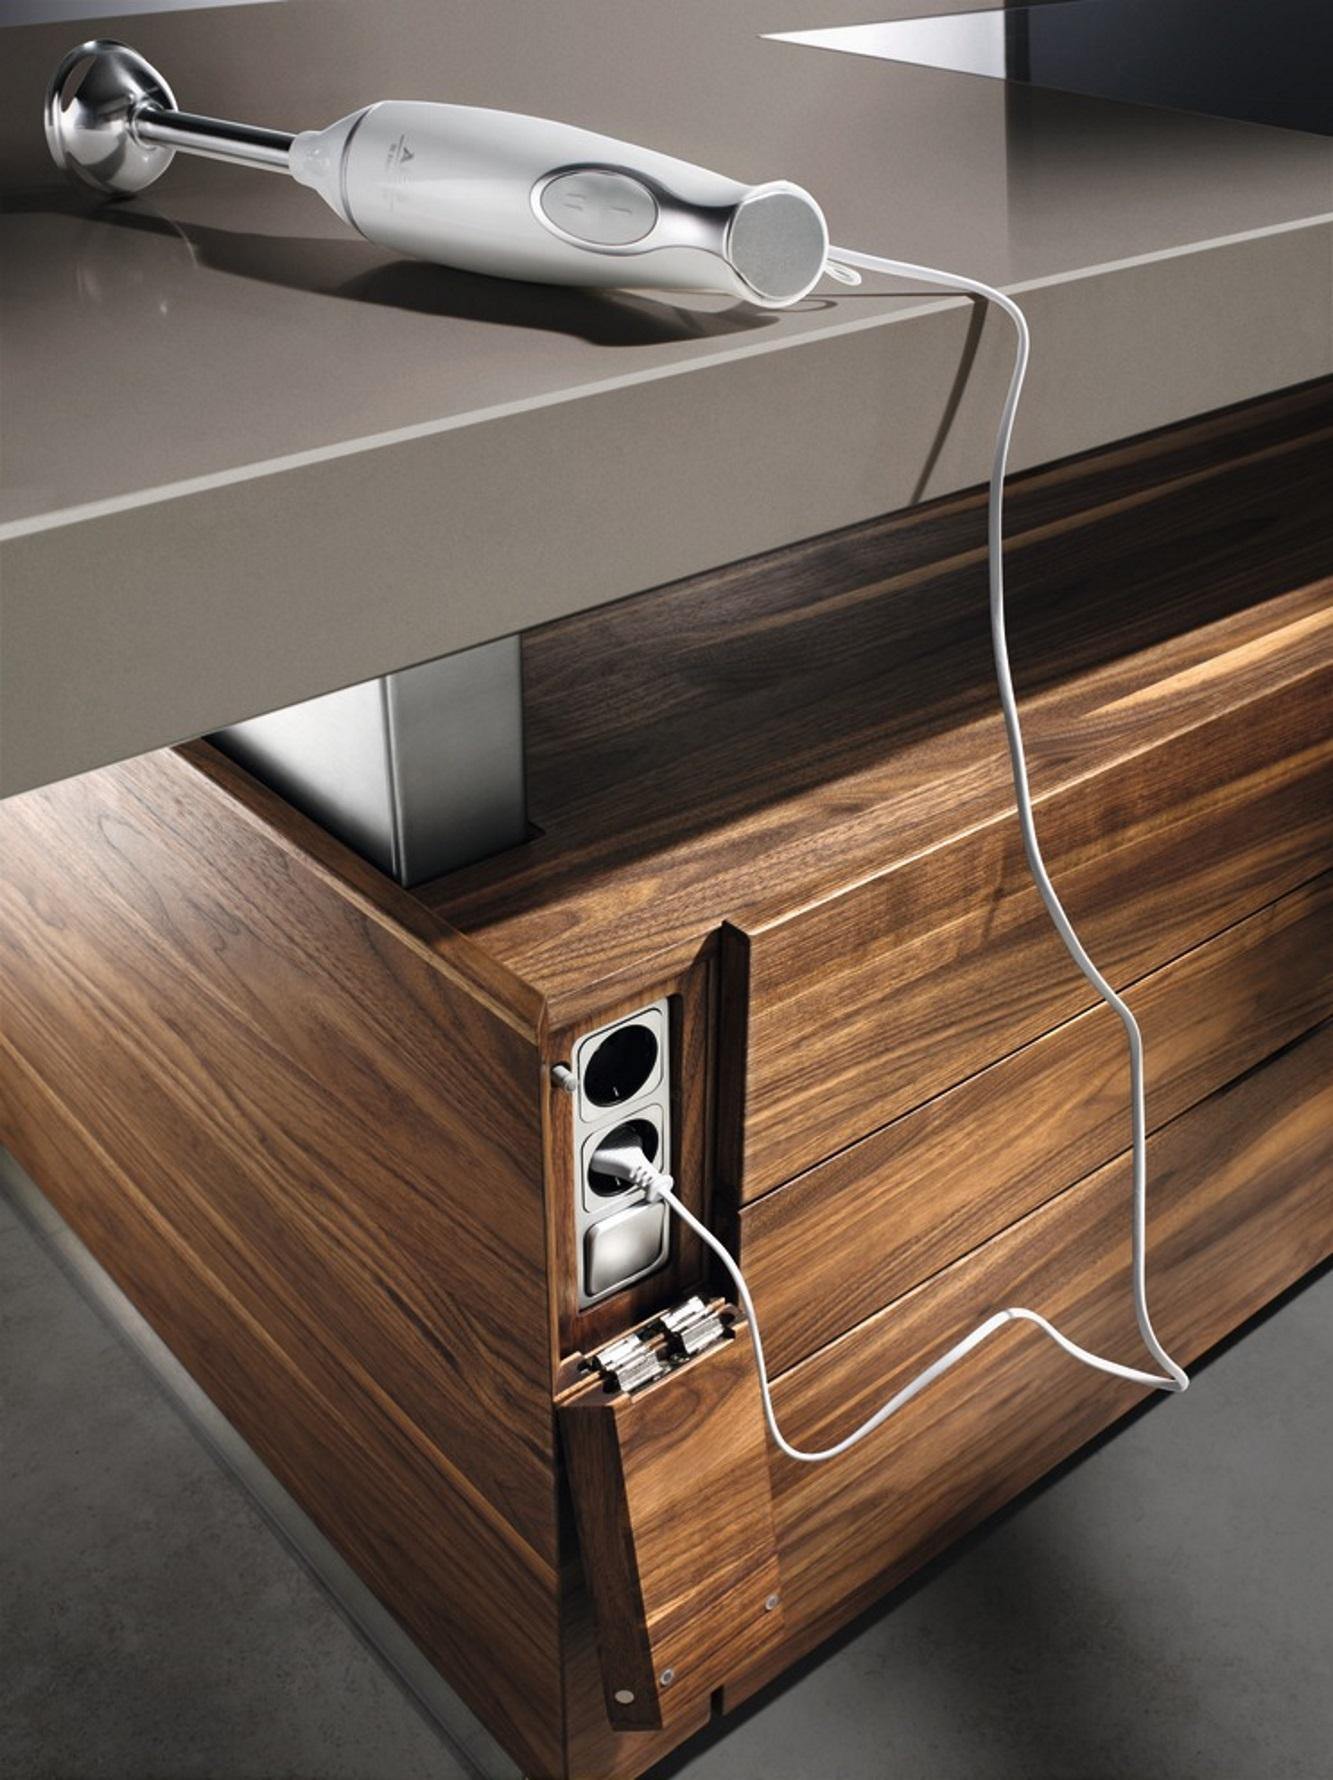 versenkbare steckdose k che haus design ideen. Black Bedroom Furniture Sets. Home Design Ideas